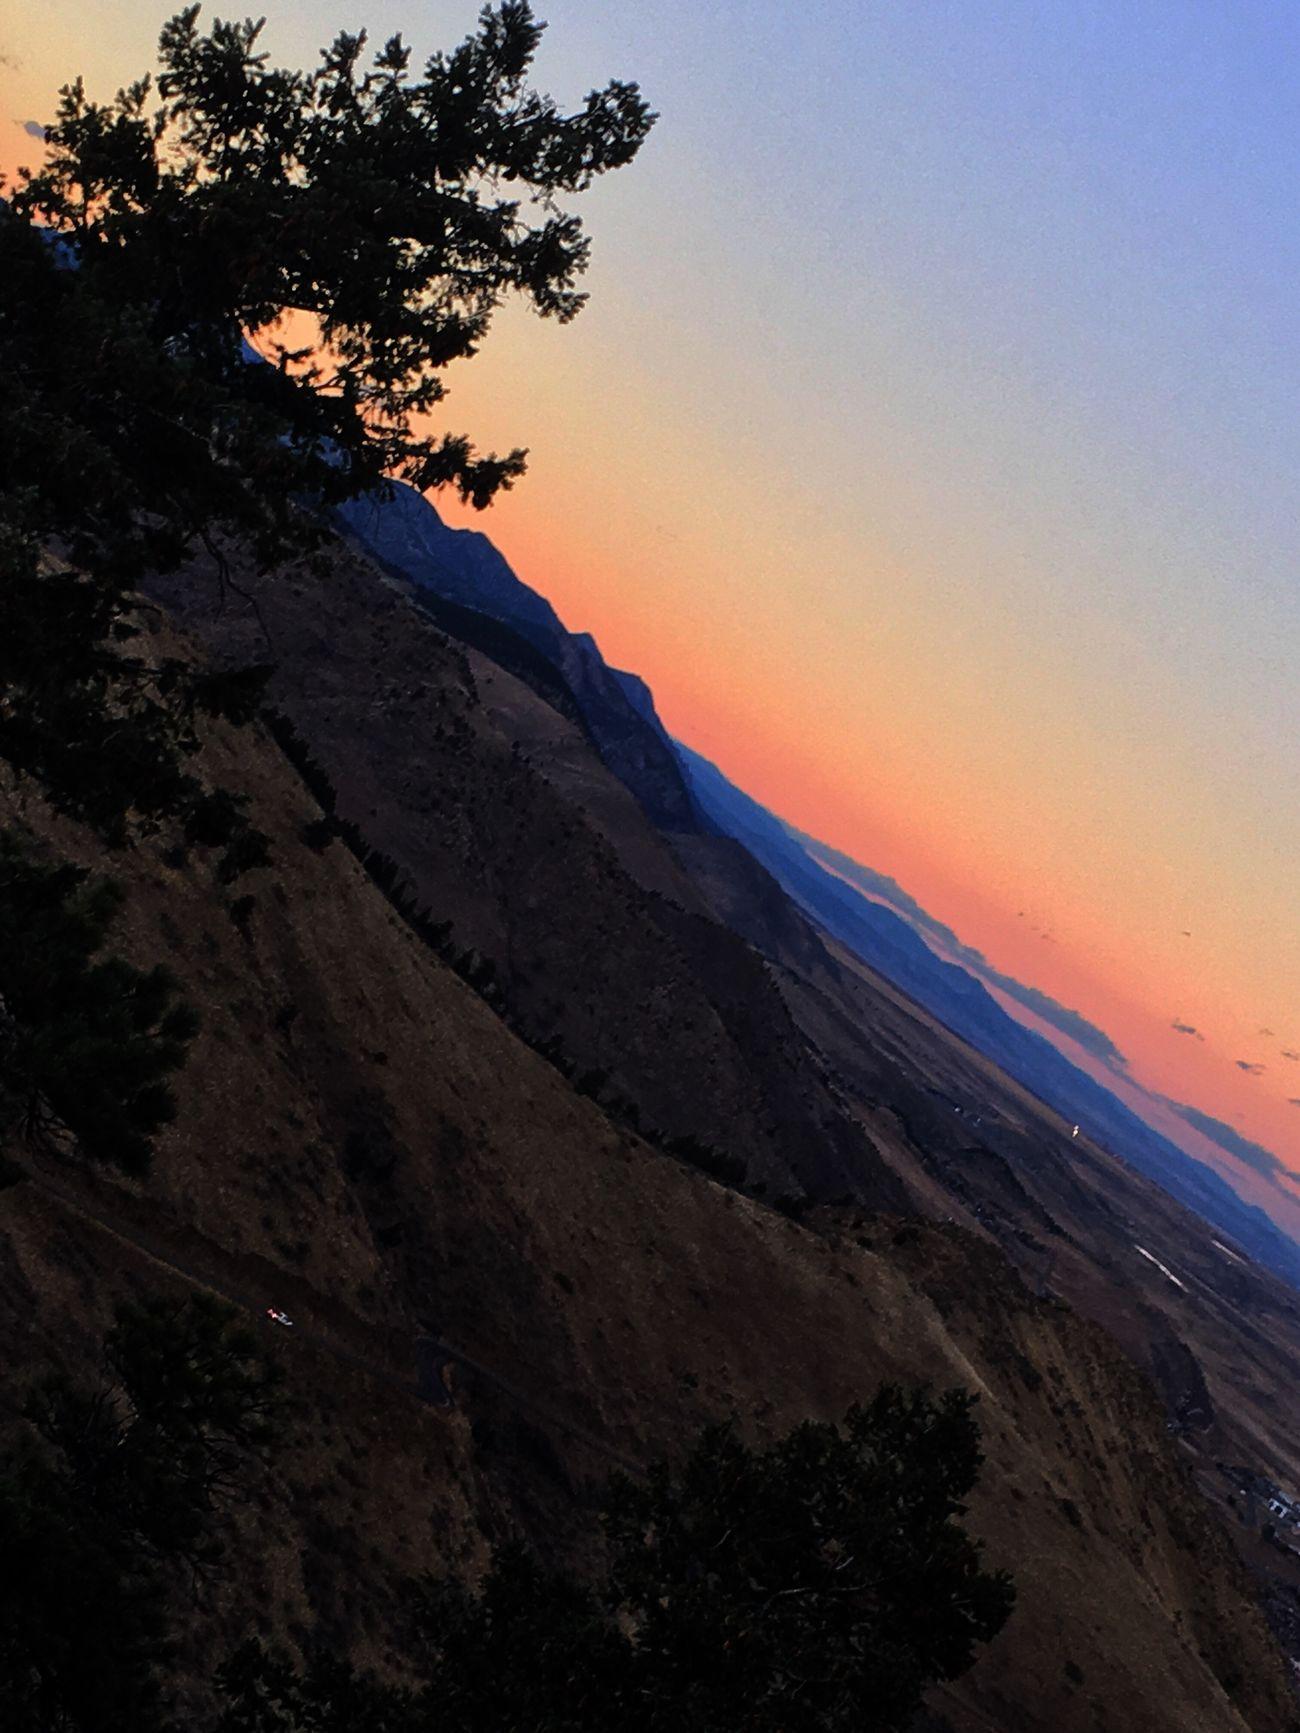 Sunset from Lookout Mountain, Denver, CO Denver,CO Lookout Mountain Outdoors Nature Sunset